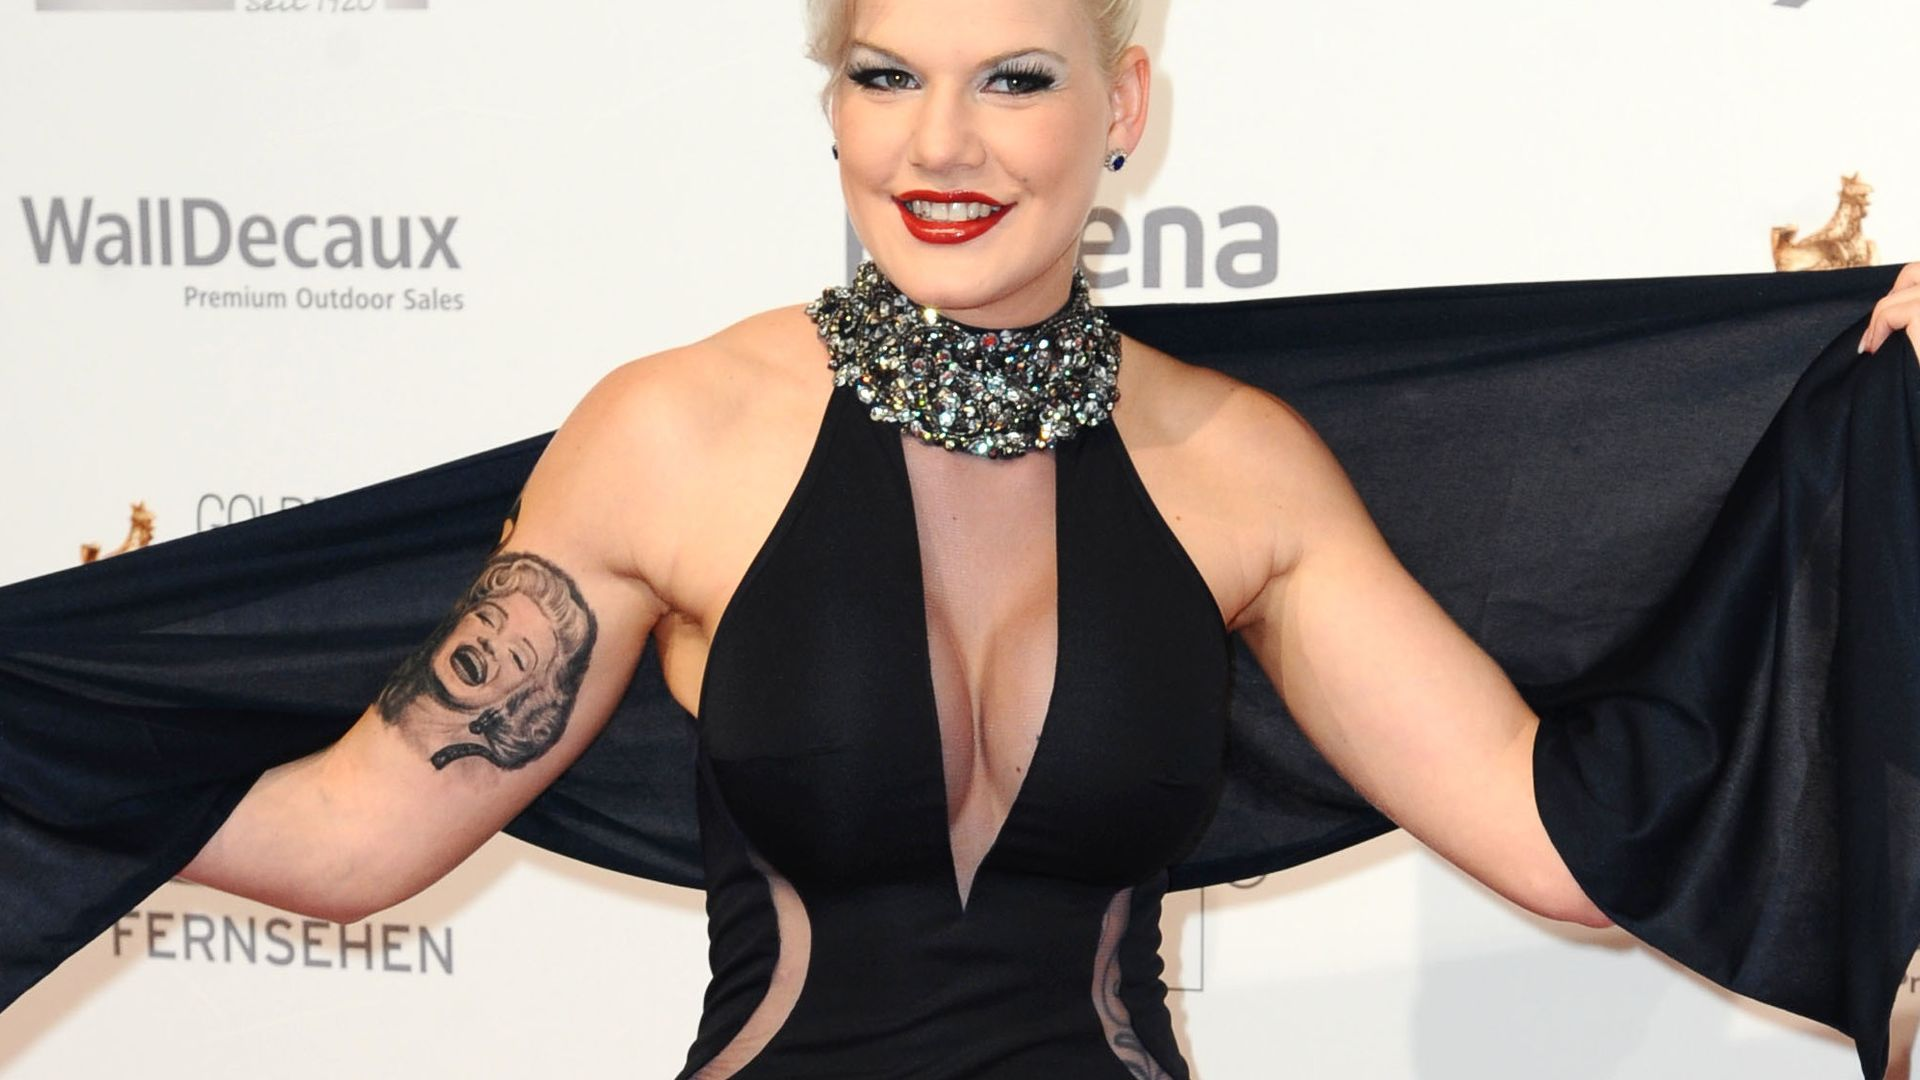 Lexy rox nackt